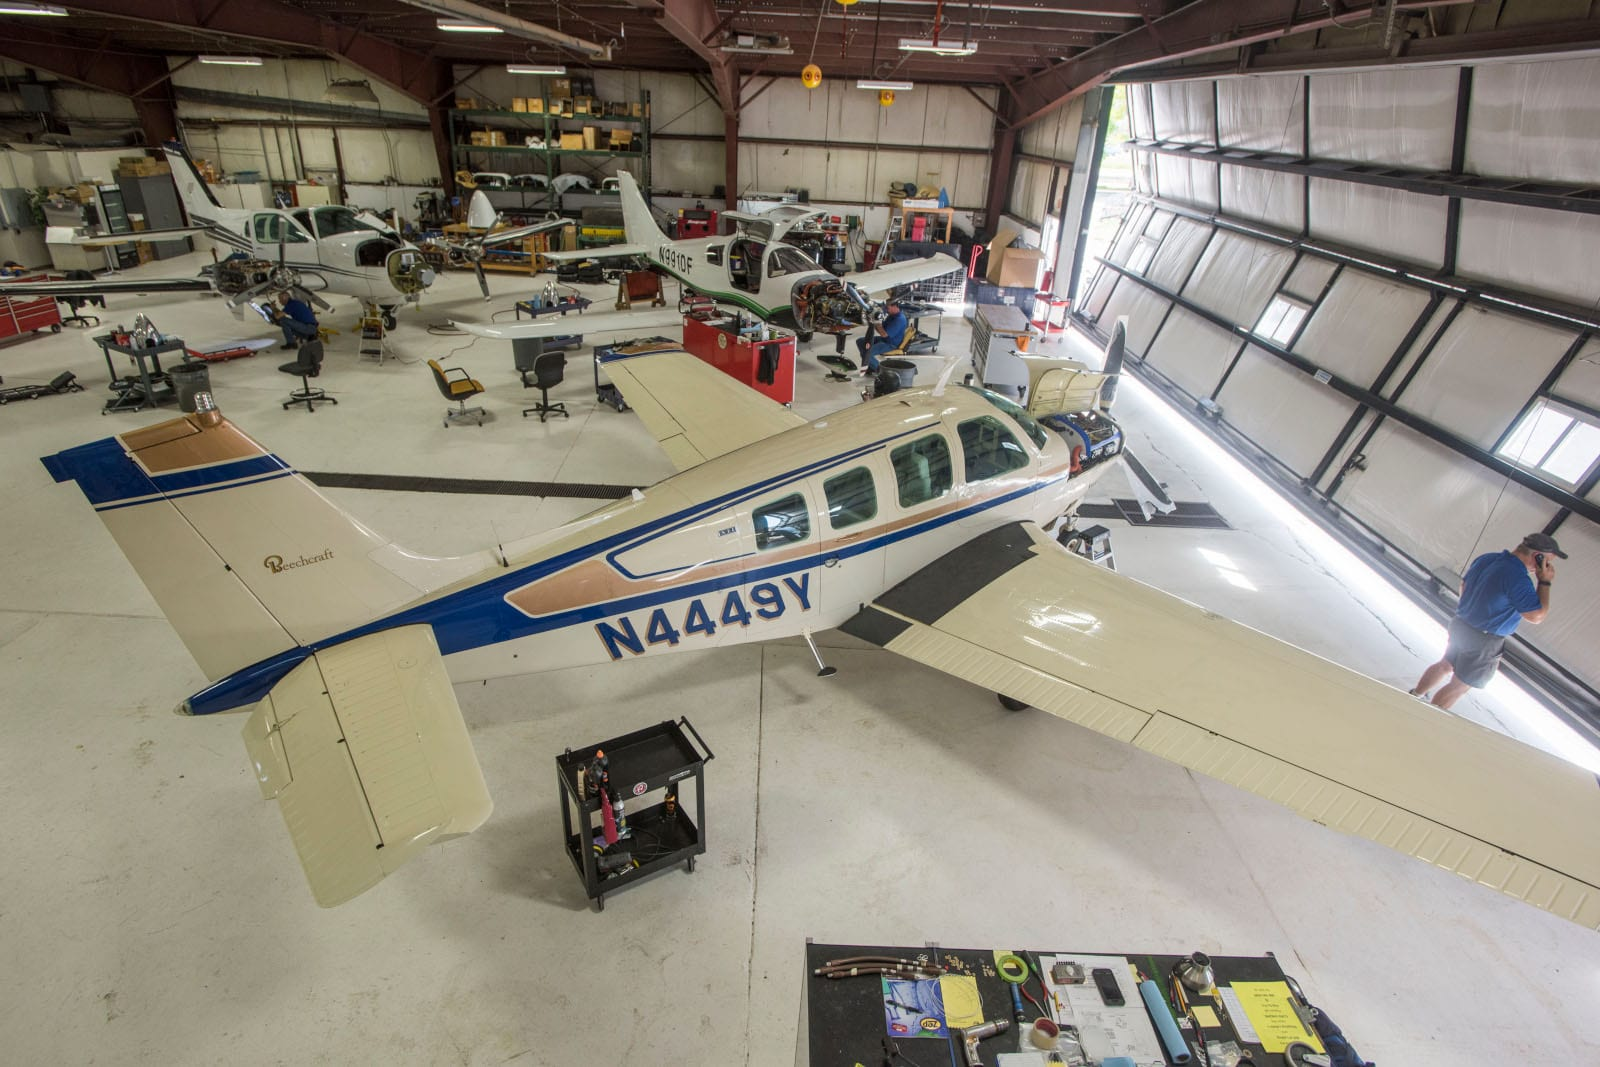 Northern Colorado Regional Airport Plane Hanger